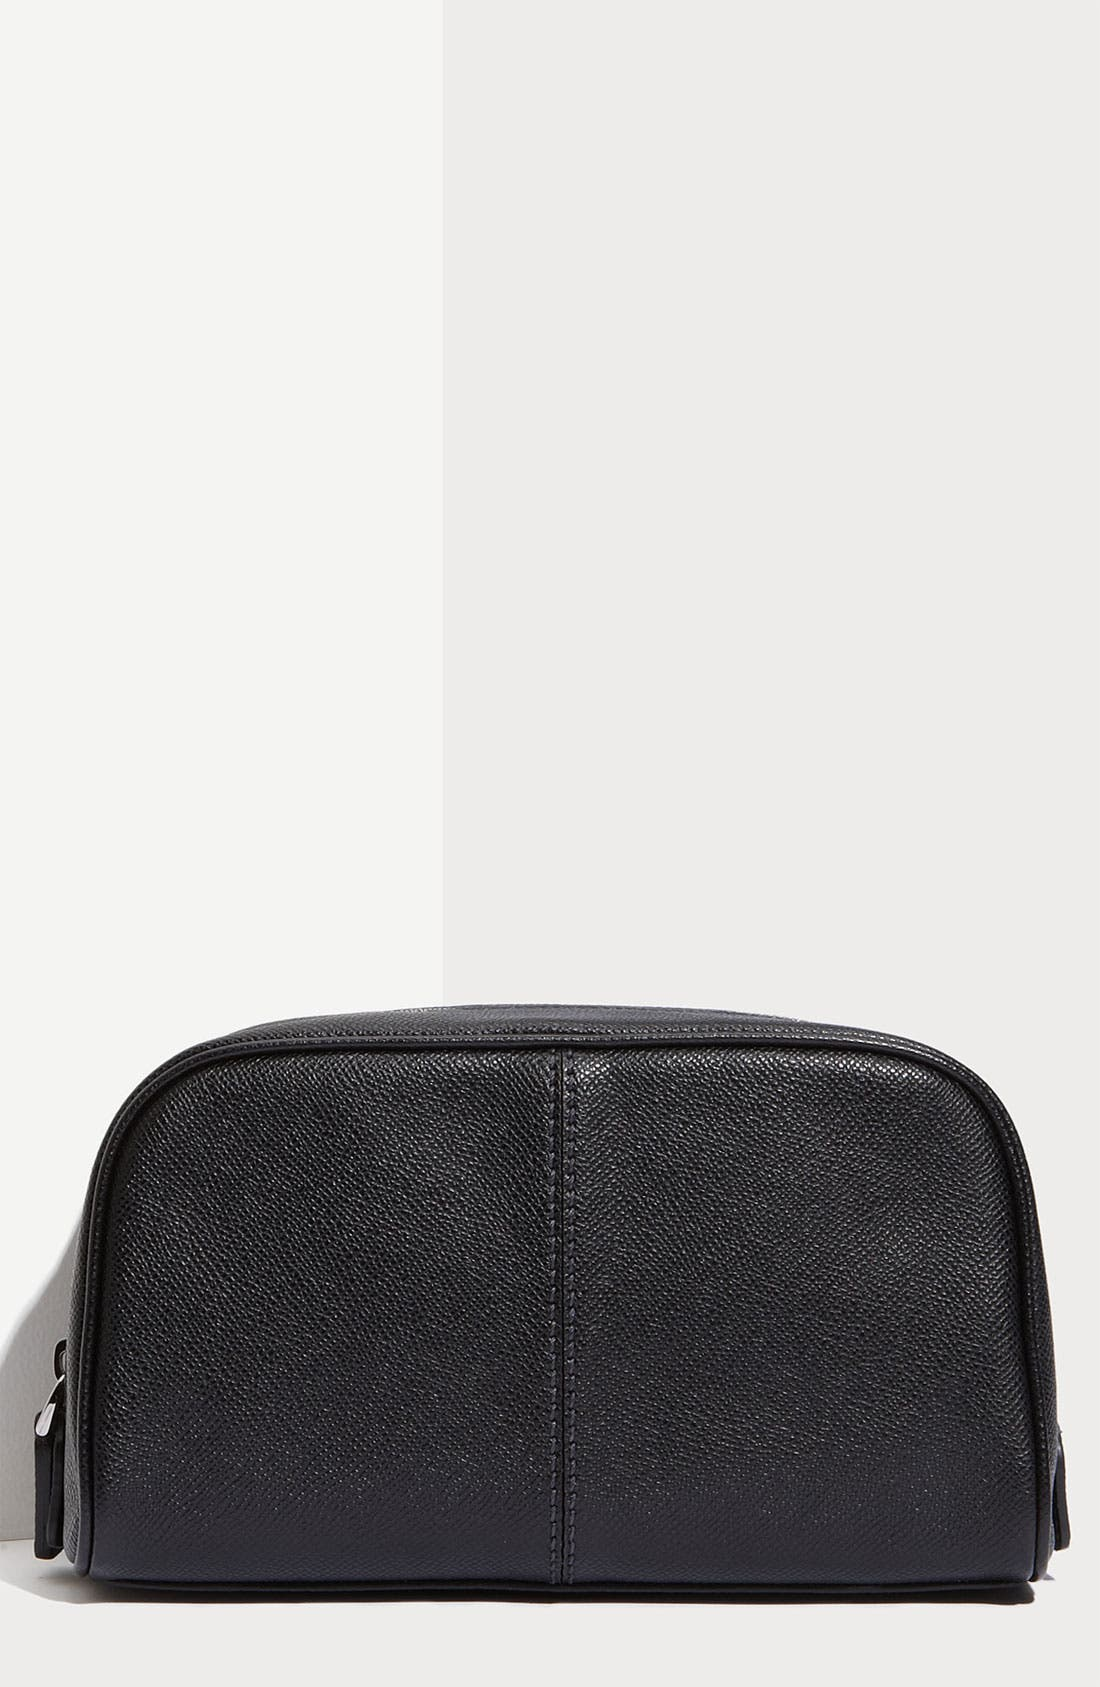 Alternate Image 1 Selected - Tod's Wash Bag